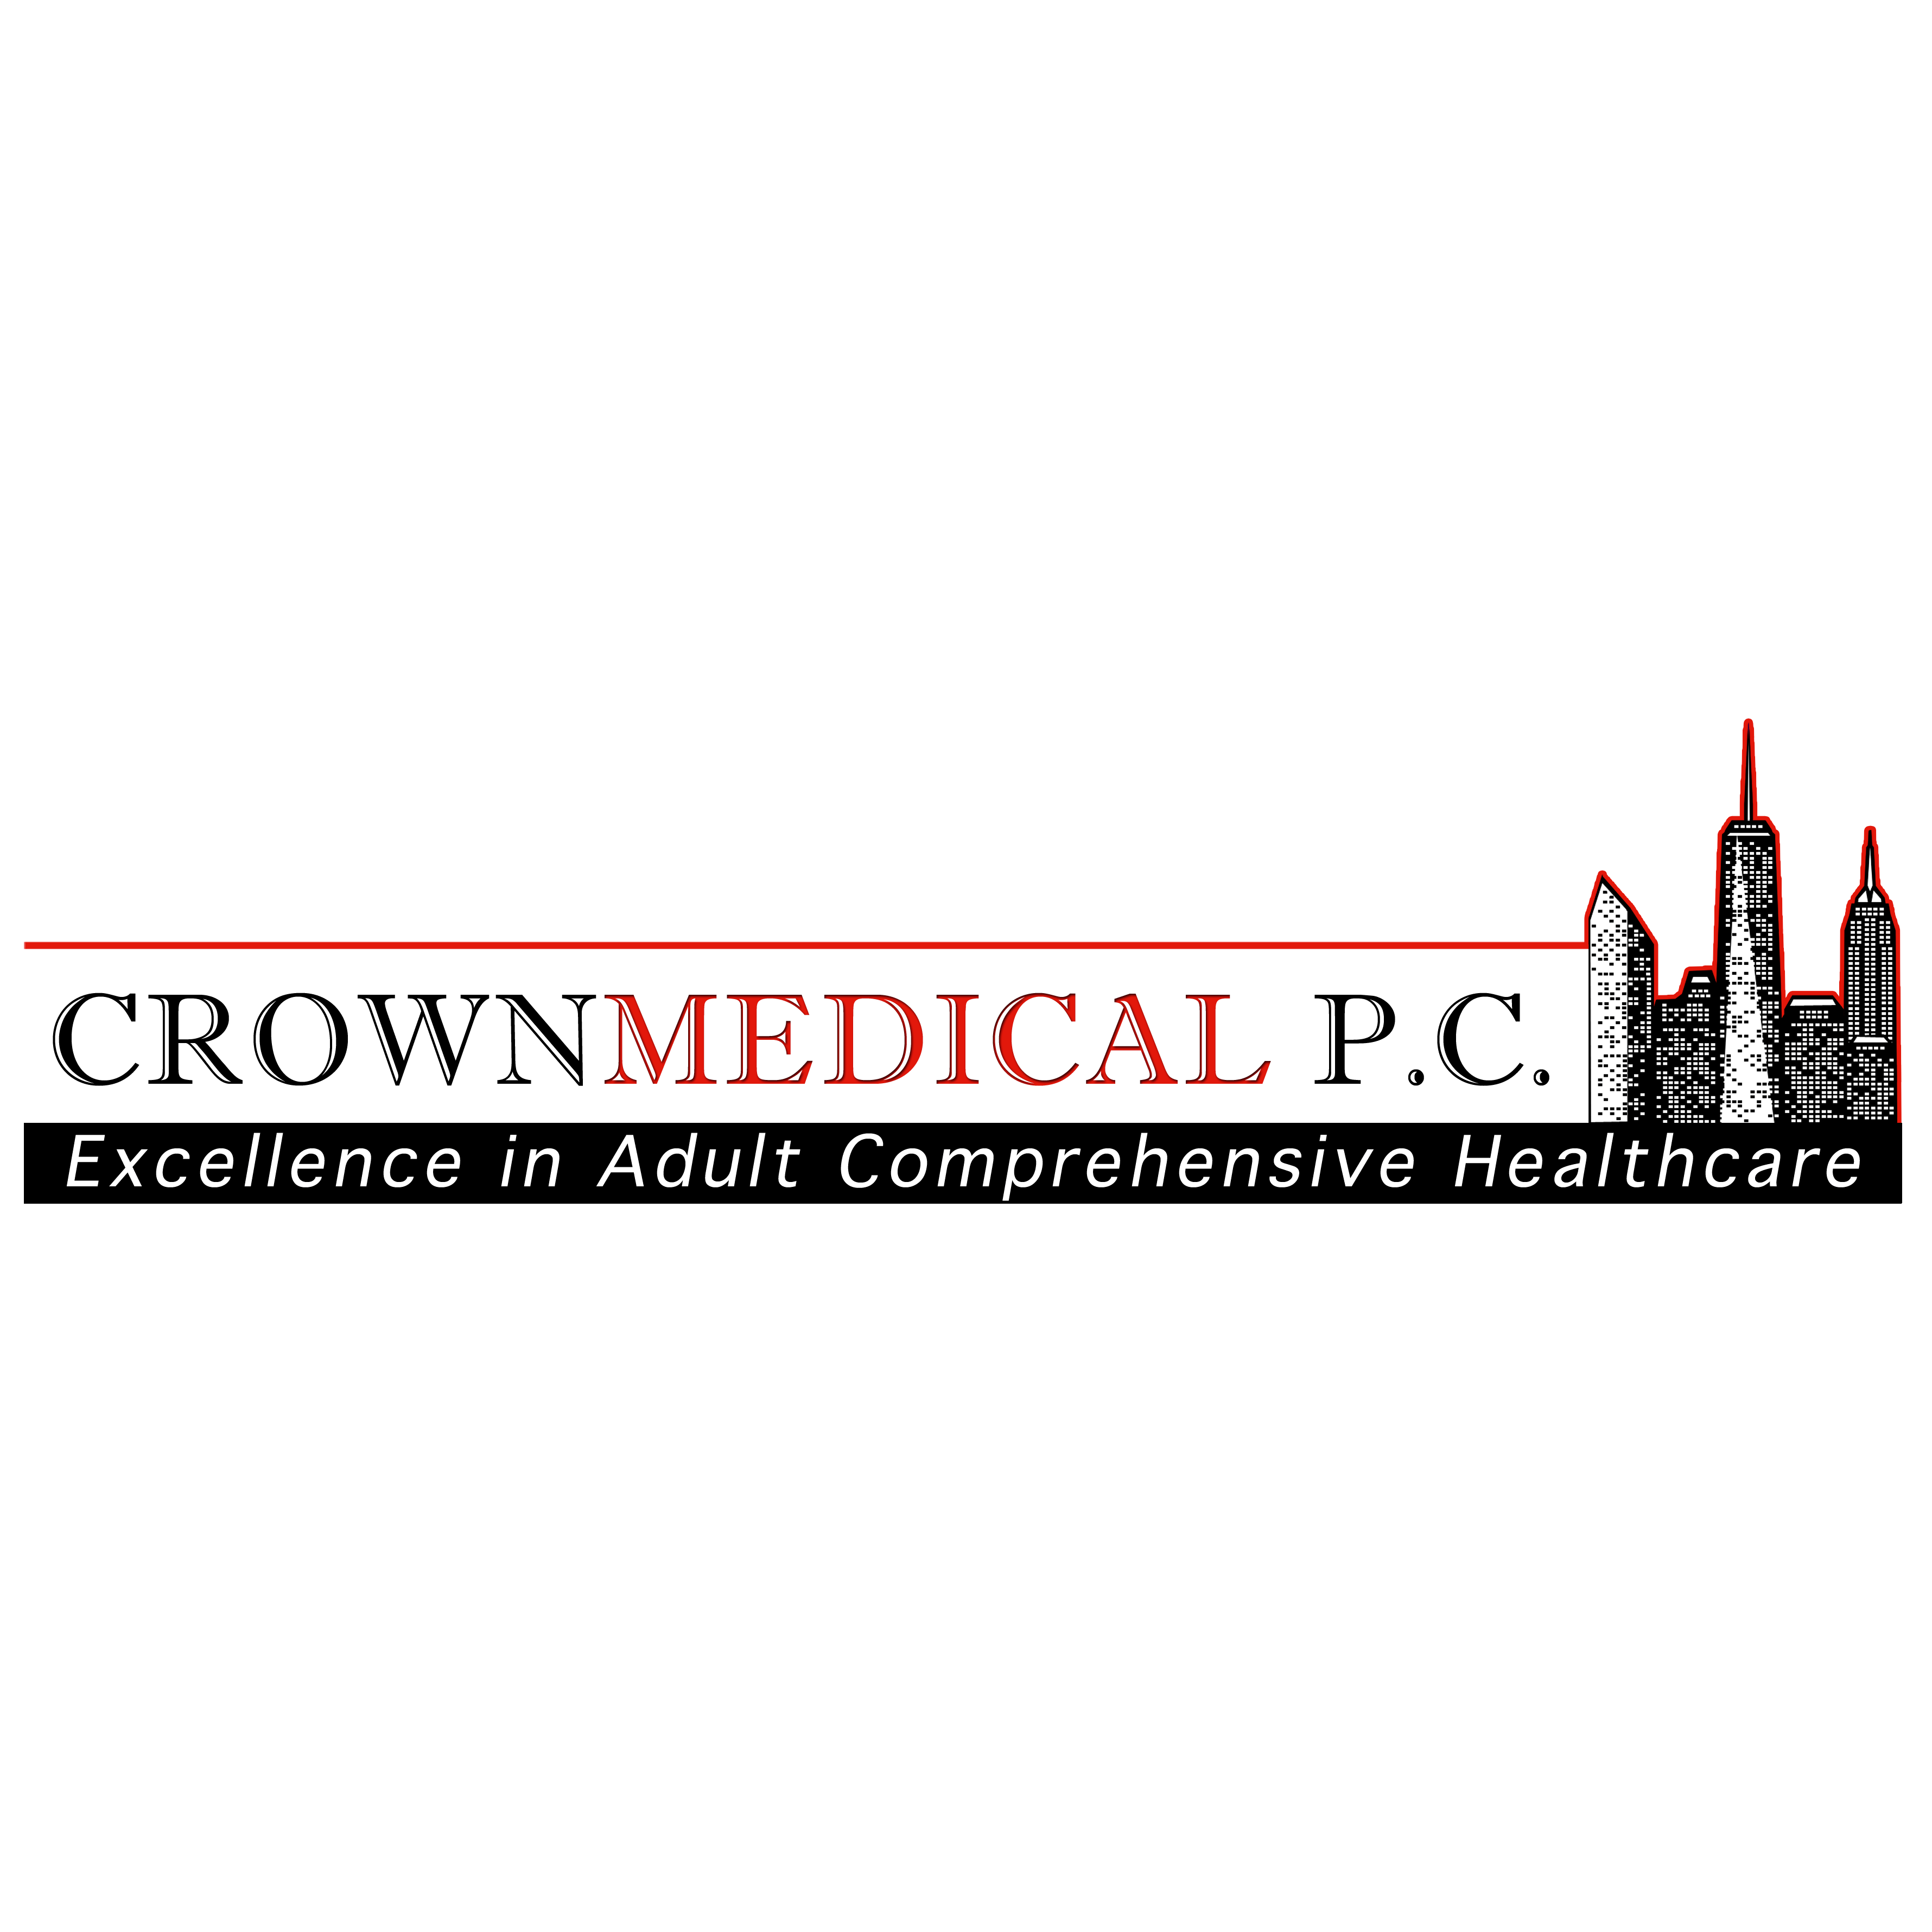 Crown Medical, PC